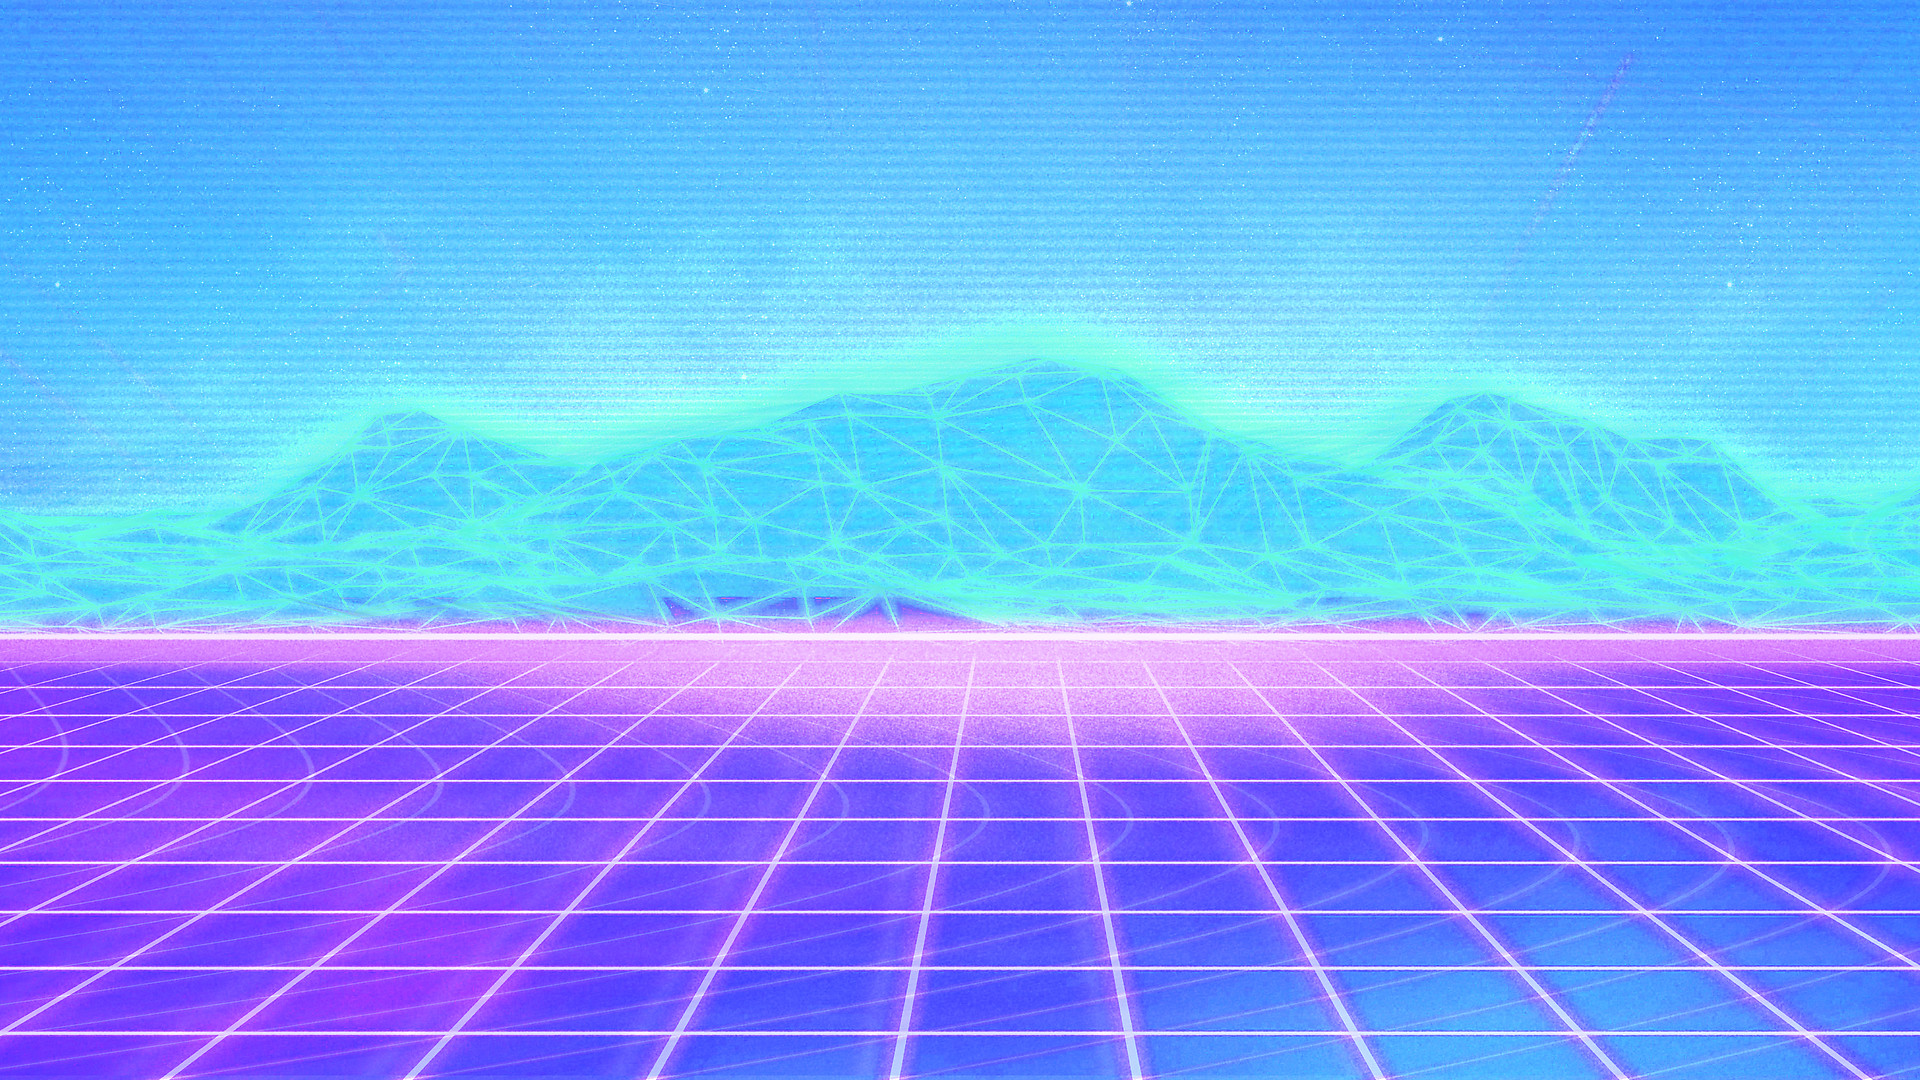 vaporwave hd wallpaper background image 1920x1080 id 964427